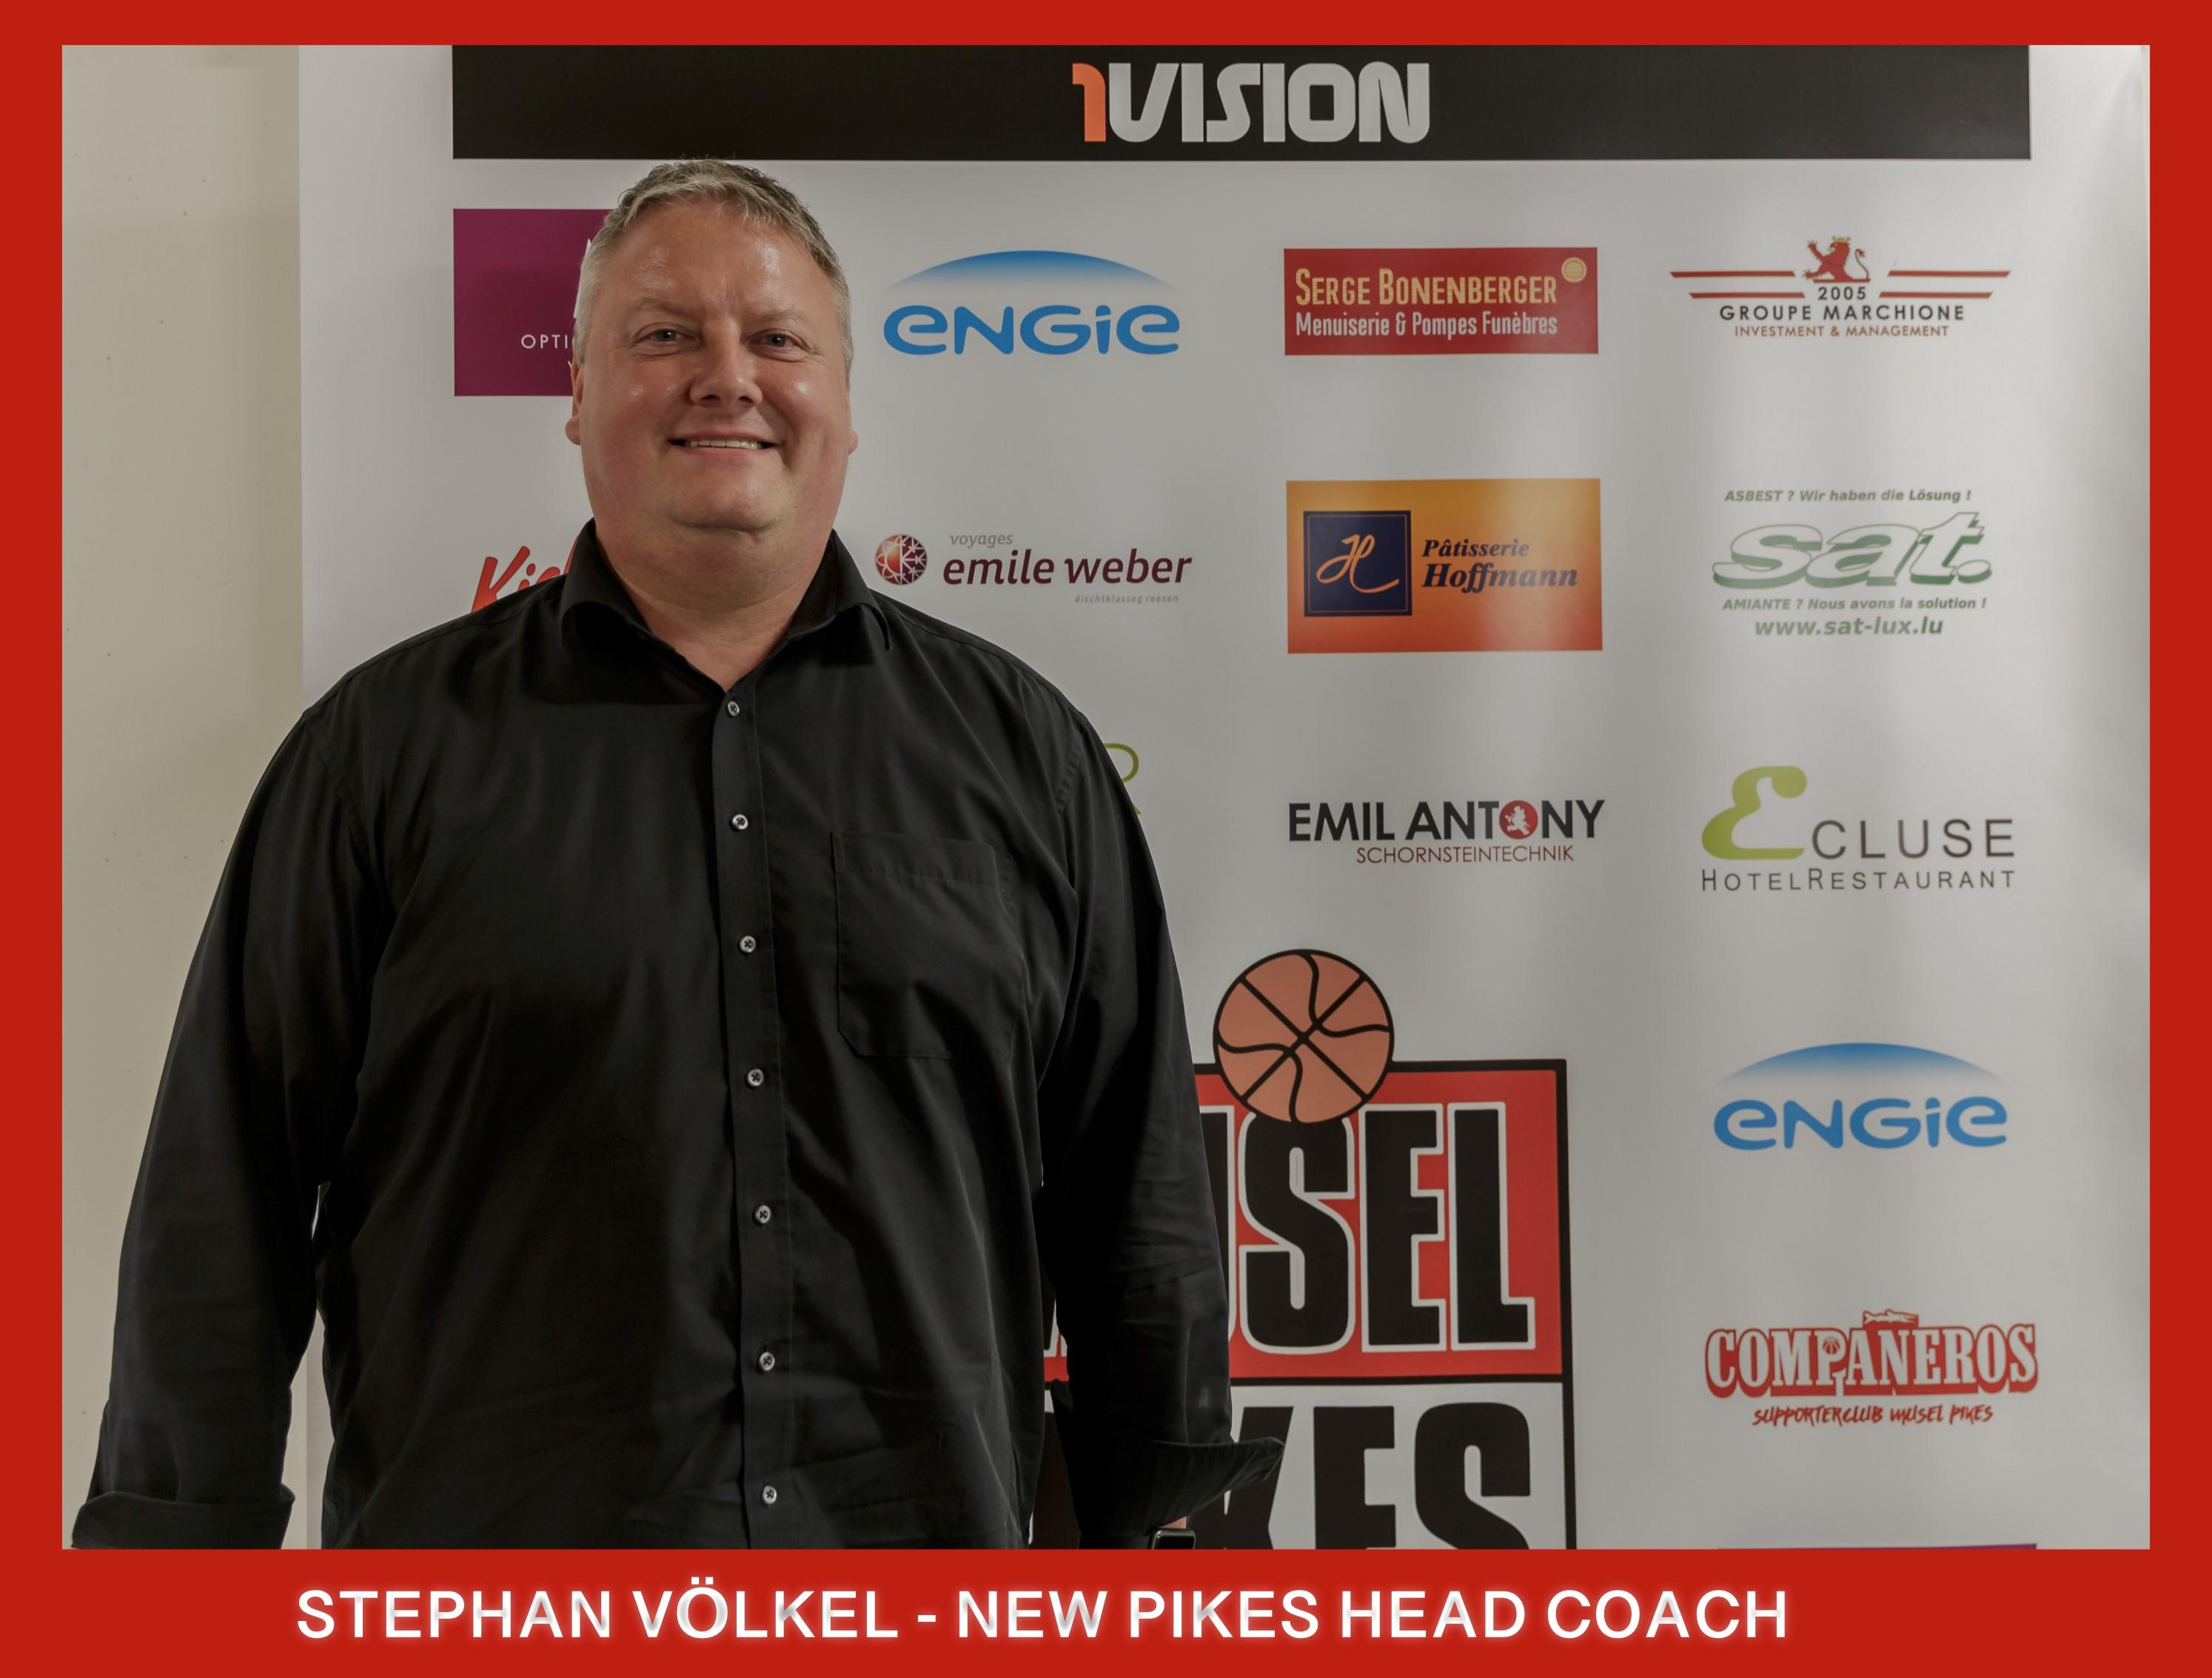 PRESSEMATDEELUNG : STEPHAN VÖLKEL = neie Pikes Head Coach